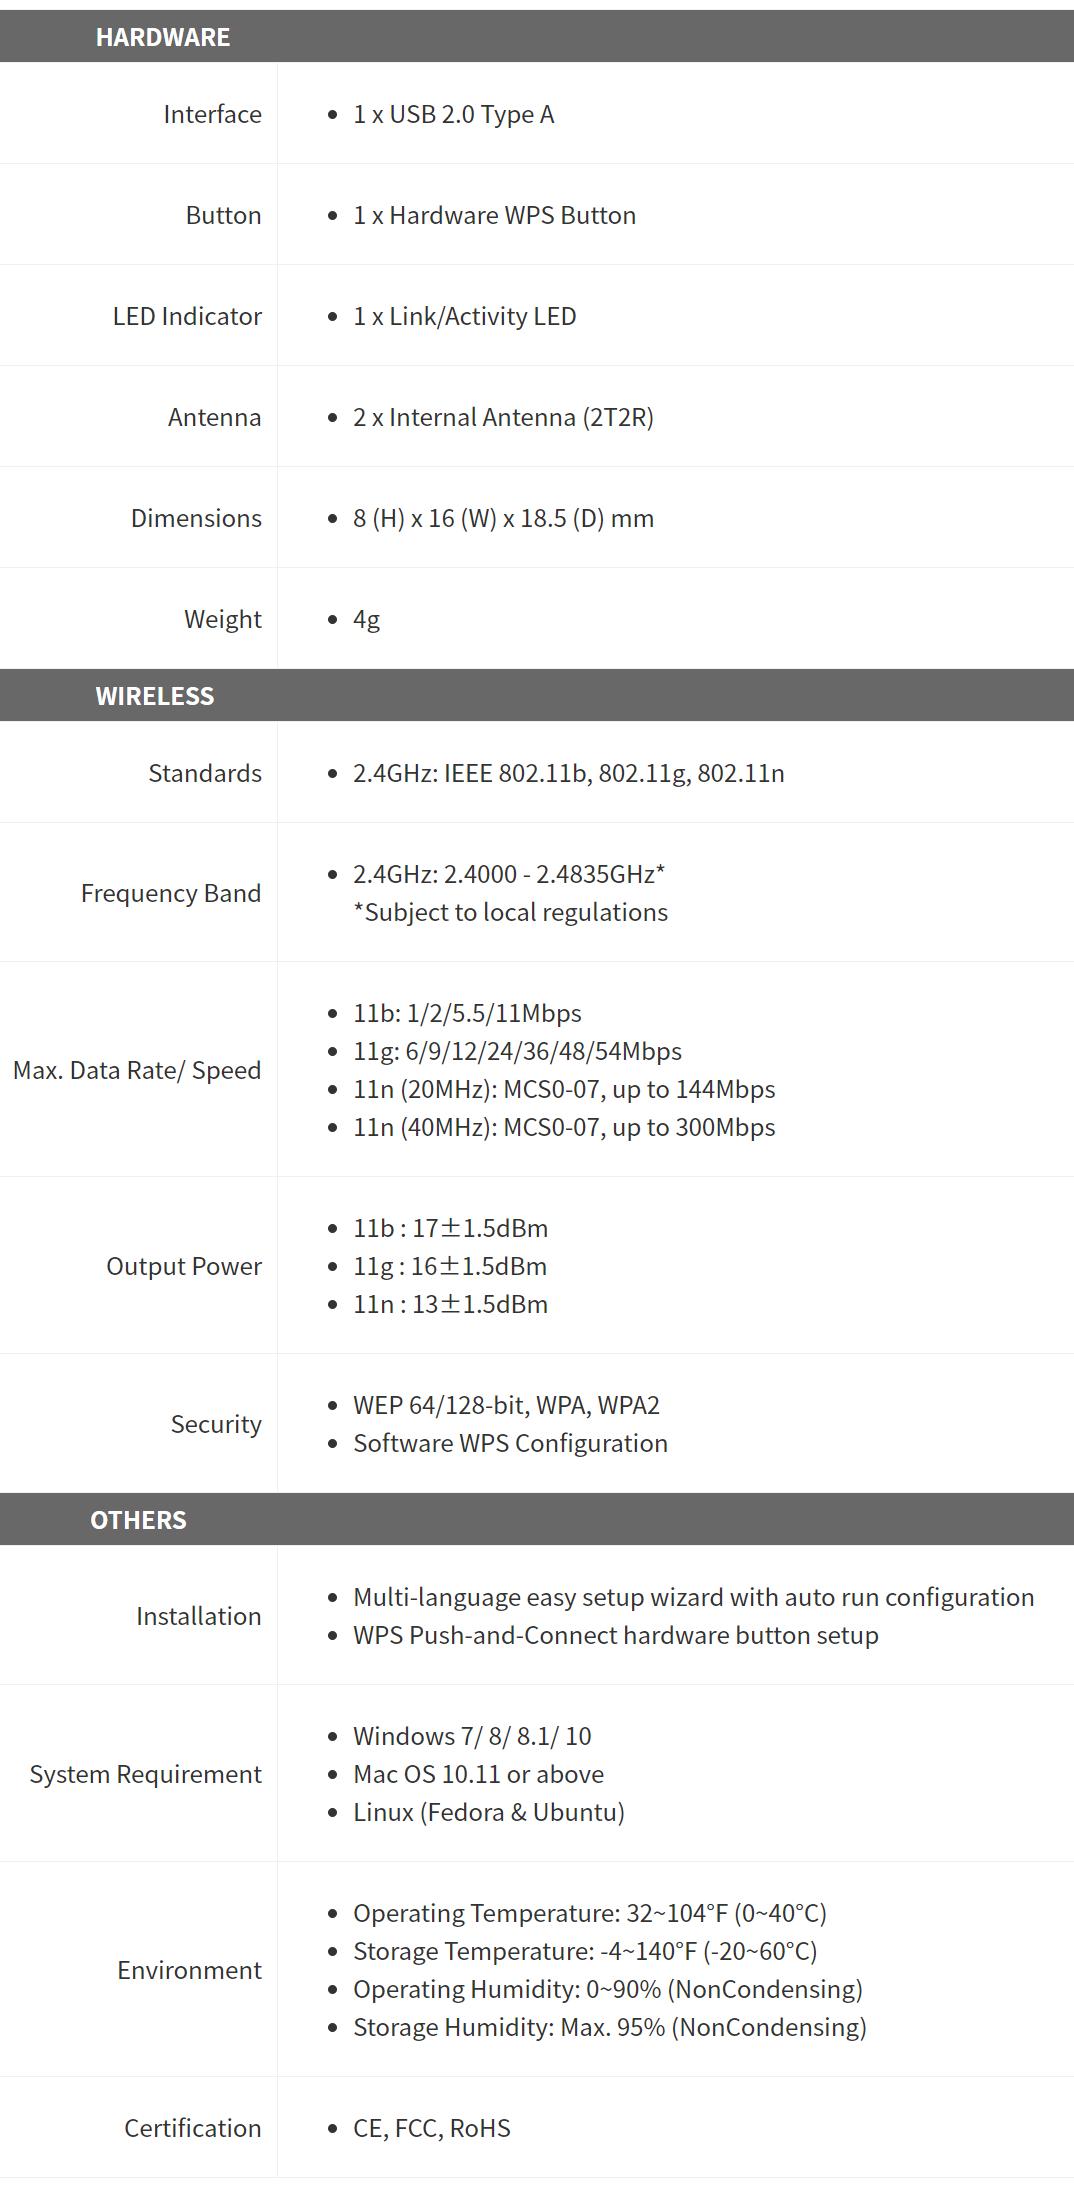 screencapture-edimax-edimax-merchandise-merchandise-detail-data-edimax-global-wireless-adapters-n300-ew-7722utn-v3-2021-02-19-11_19_50.png